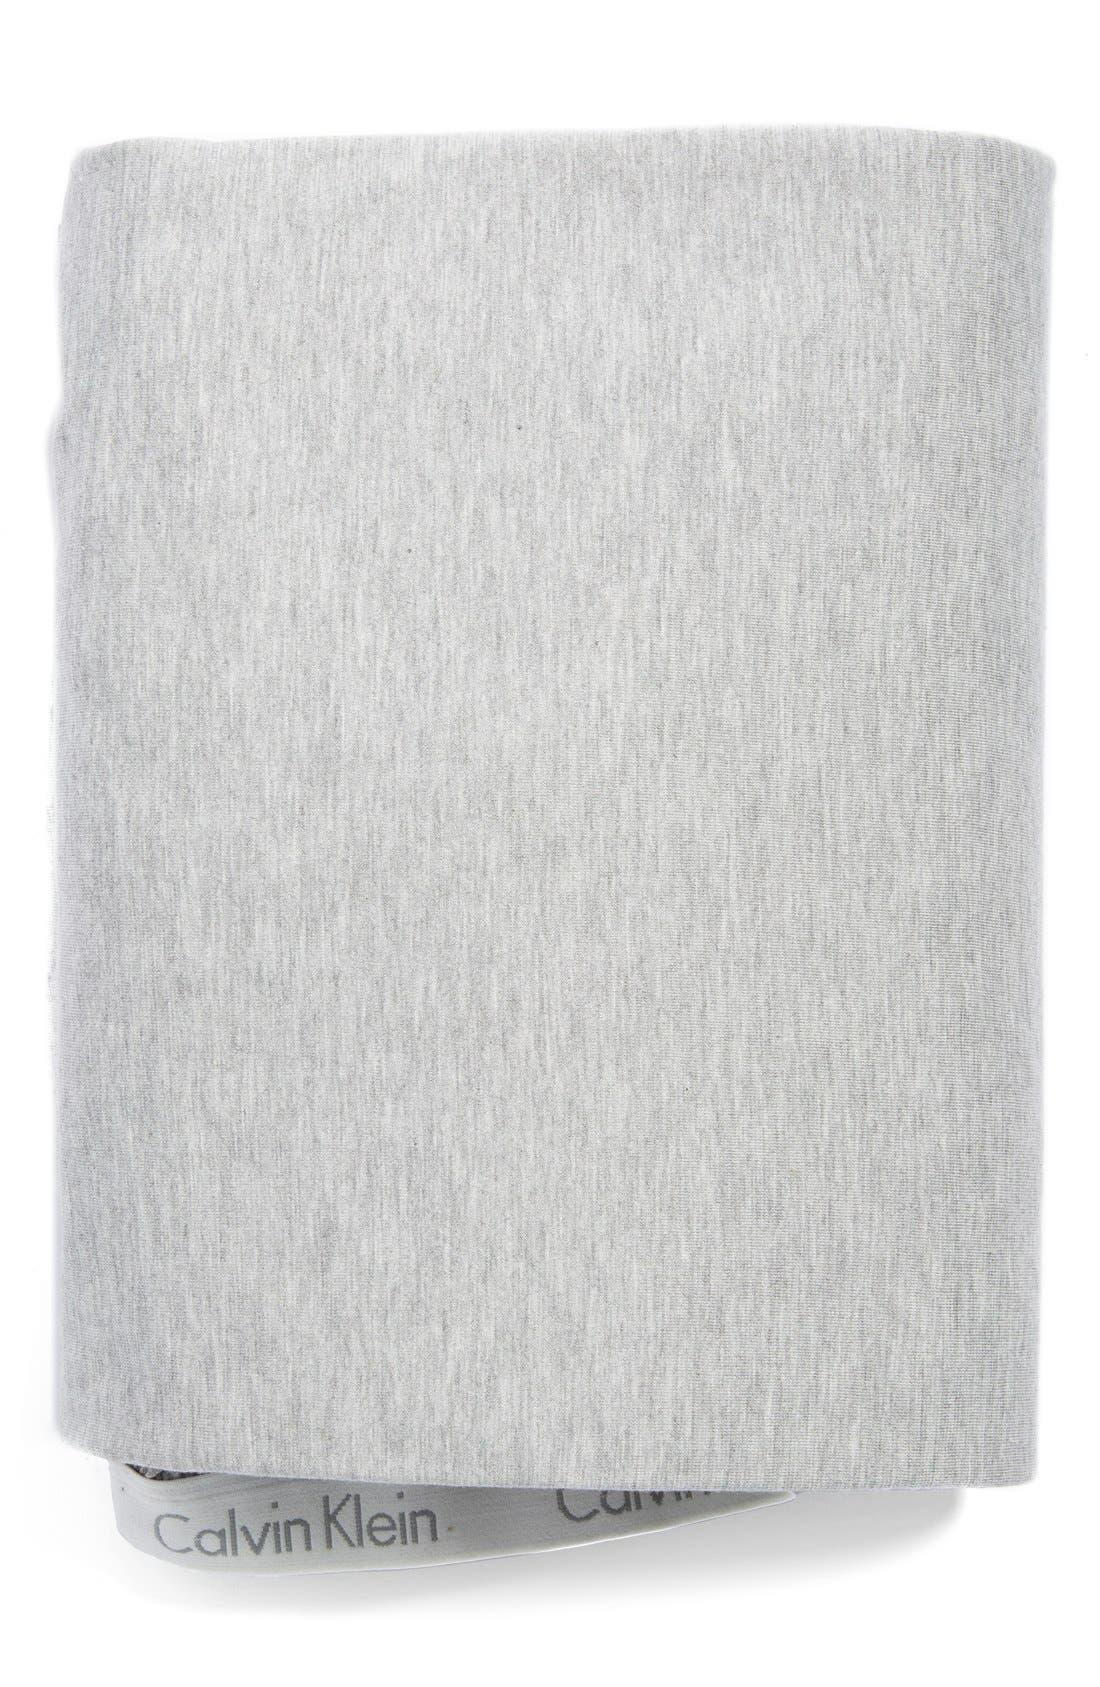 CALVIN KLEIN HOME Modern Cotton Collection Cotton & Modal Fitted Sheet, Main, color, GREY